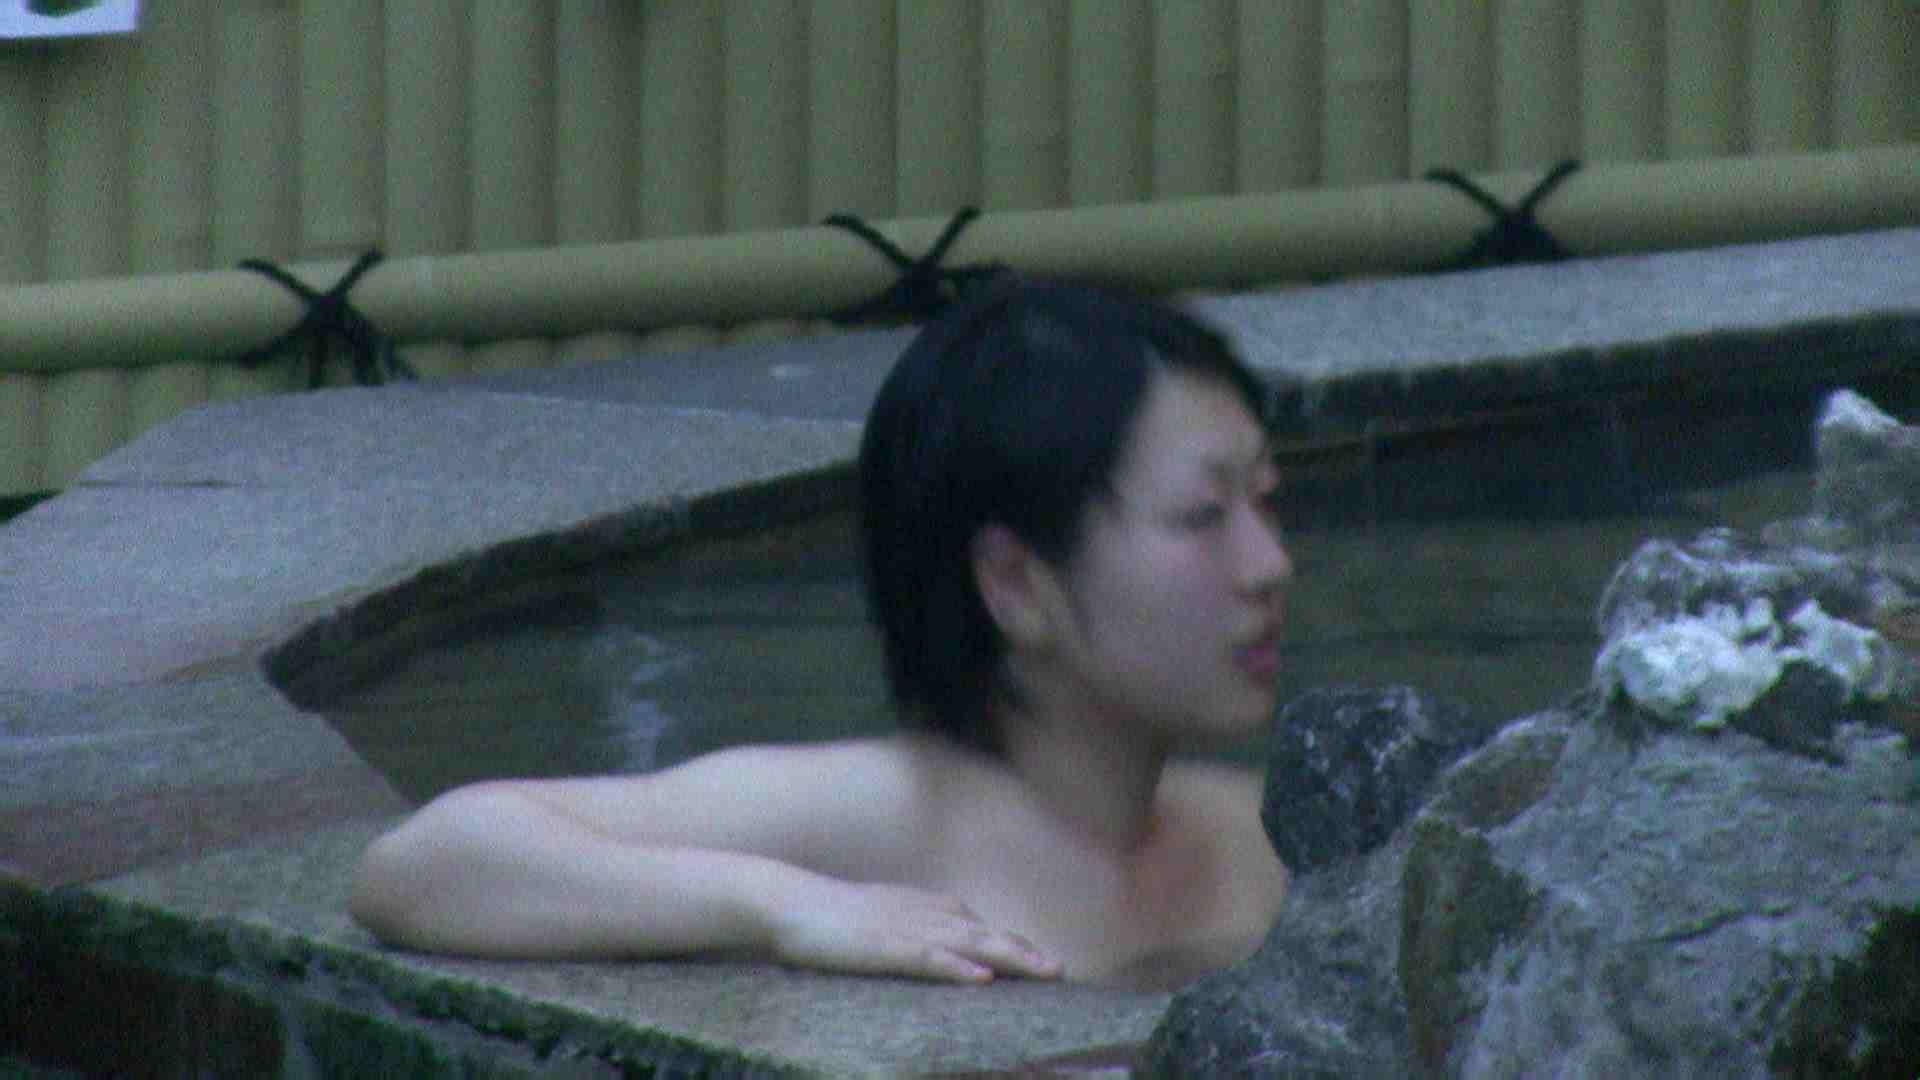 Aquaな露天風呂Vol.05【VIP】 露天風呂編 | 盗撮シリーズ  112PIX 97